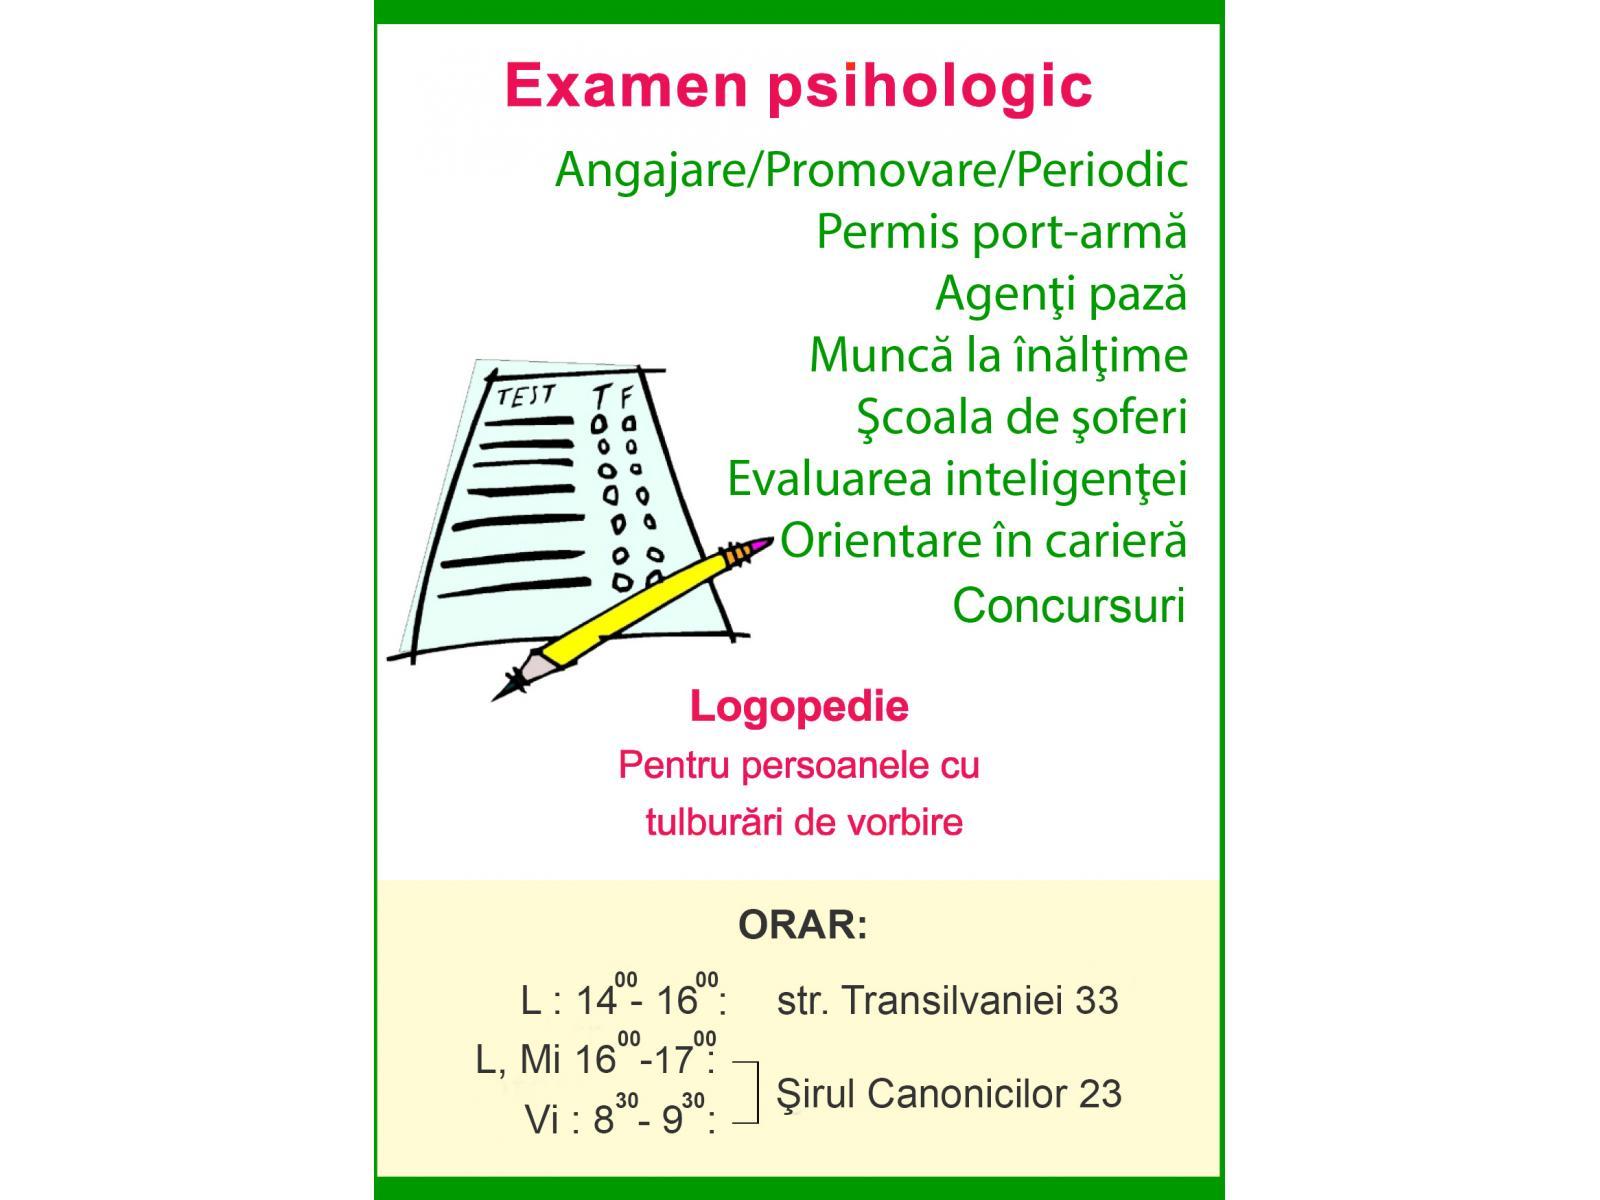 Hus Adela Cabinet Individual de Psihologie - Pliant_SPATE.jpg